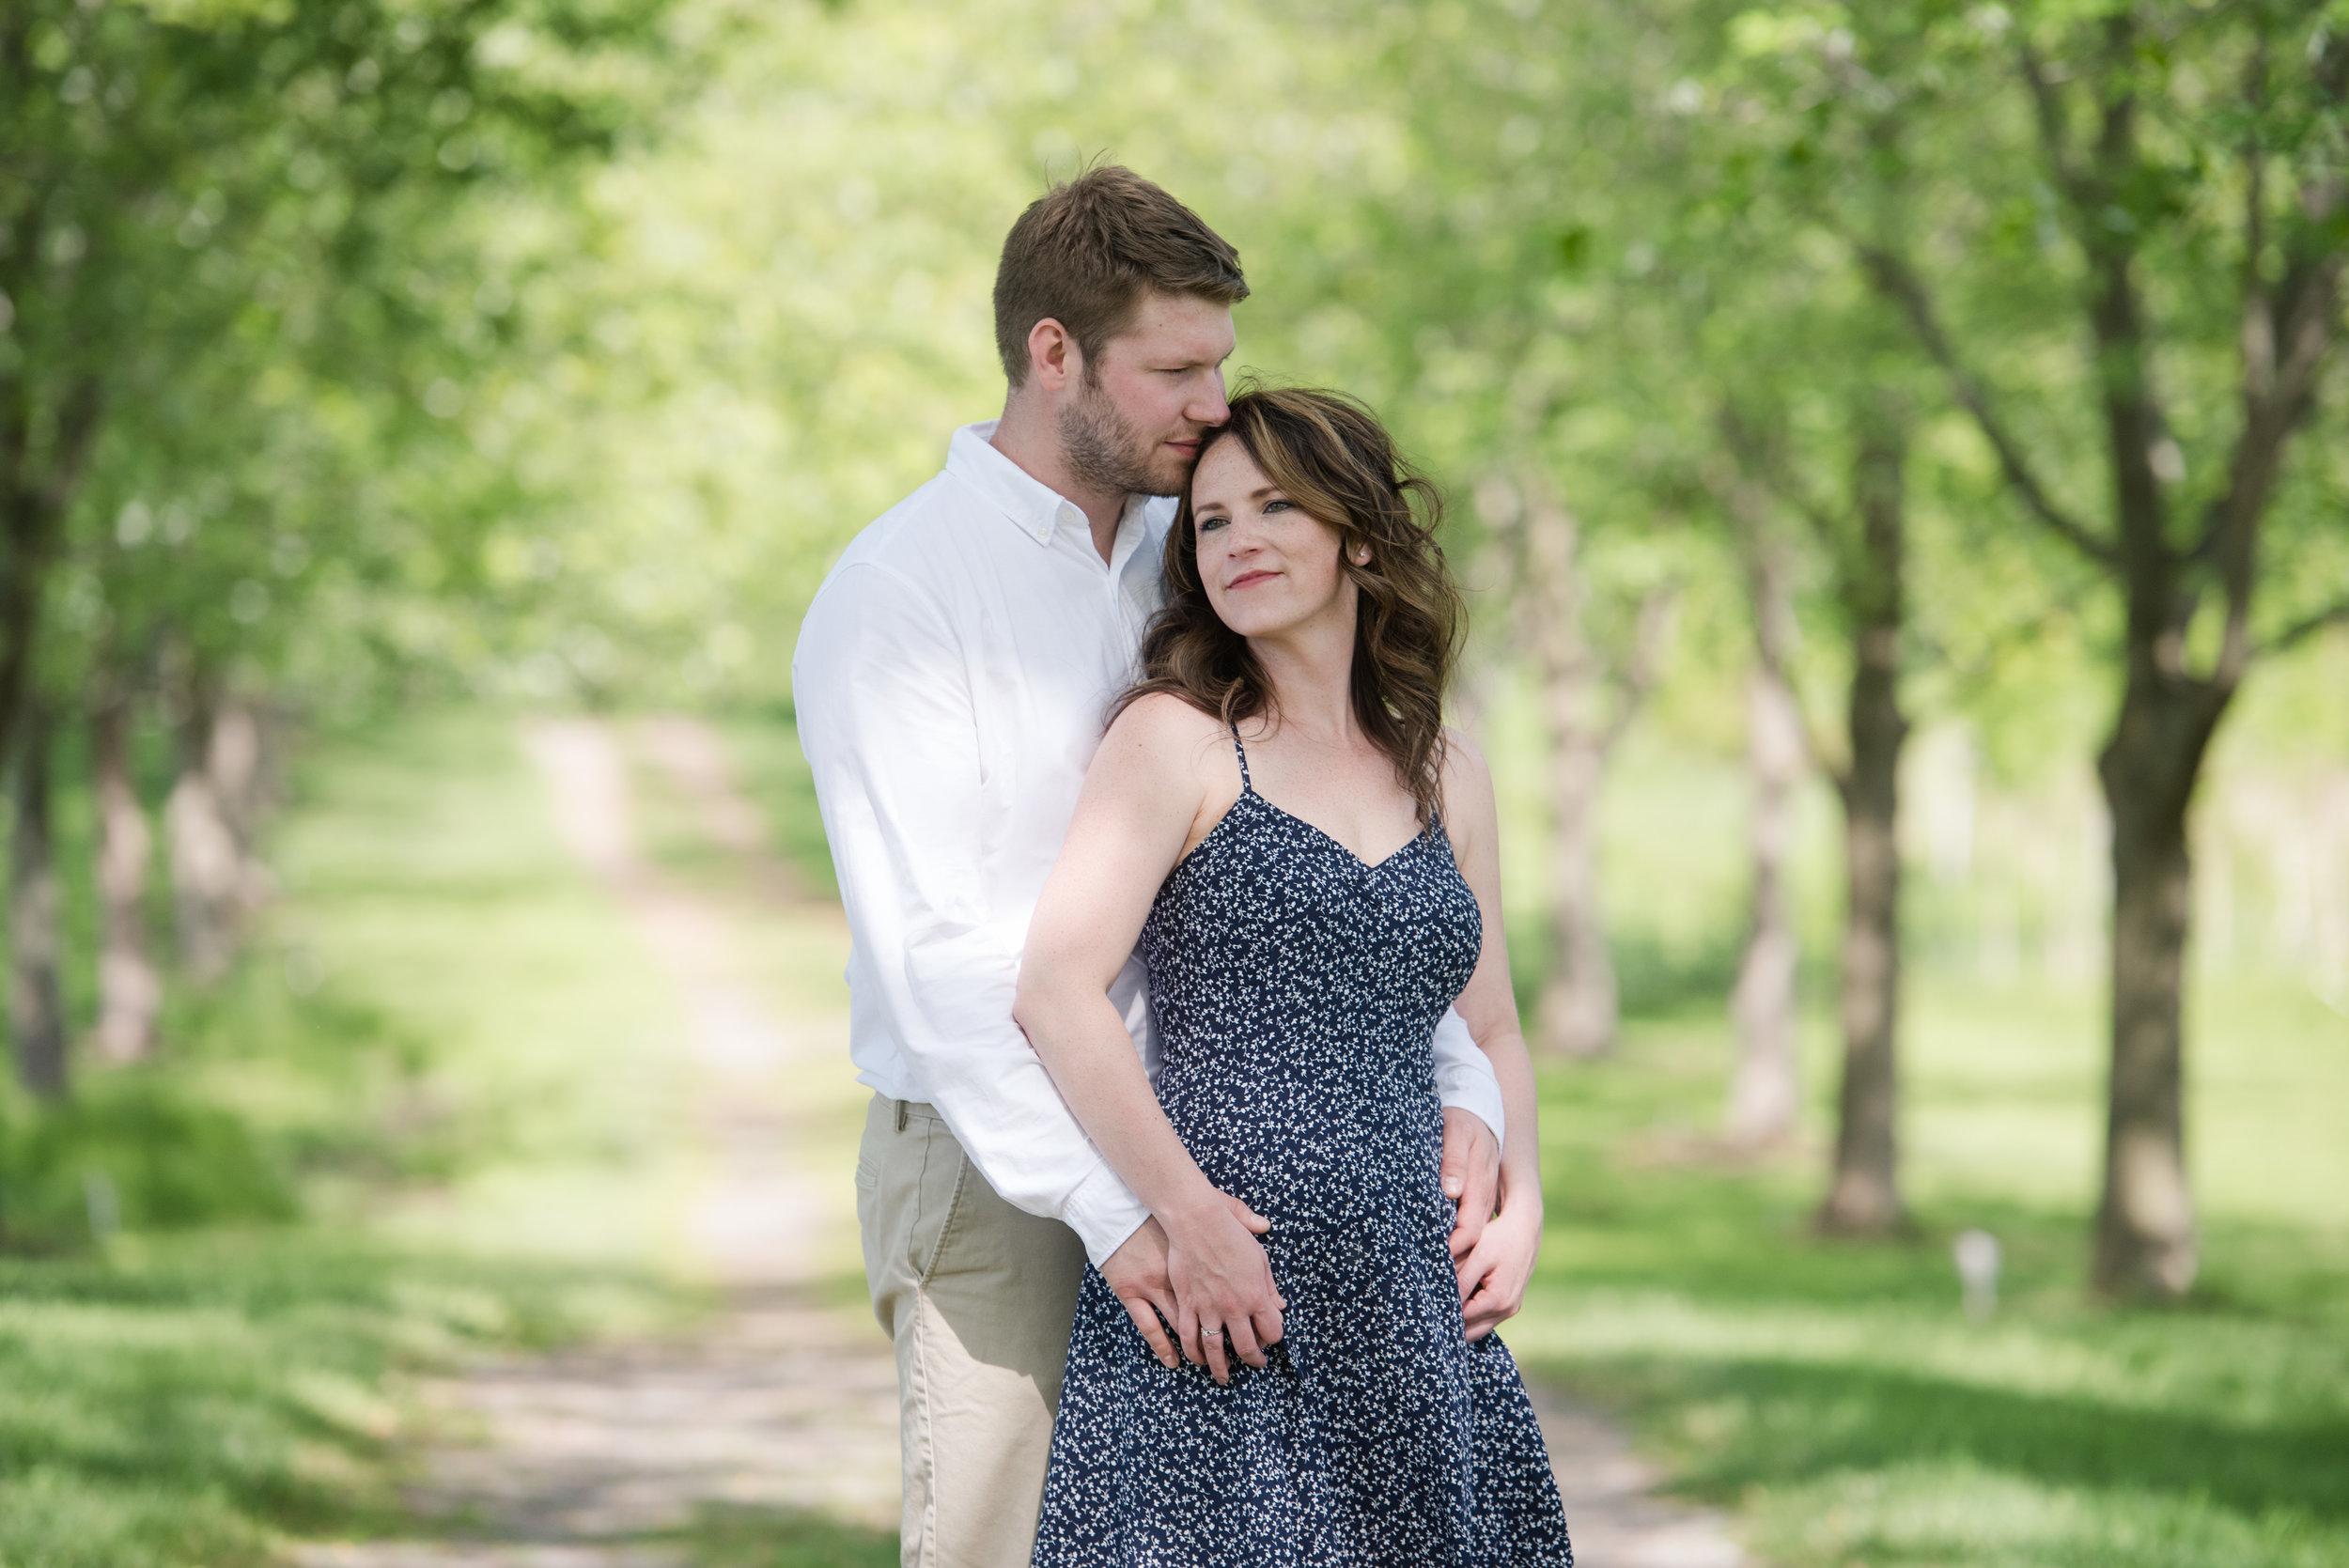 GALLERY-2019-6-9 Kaitlin, Justin & Liam Engagement 0861 128.jpg